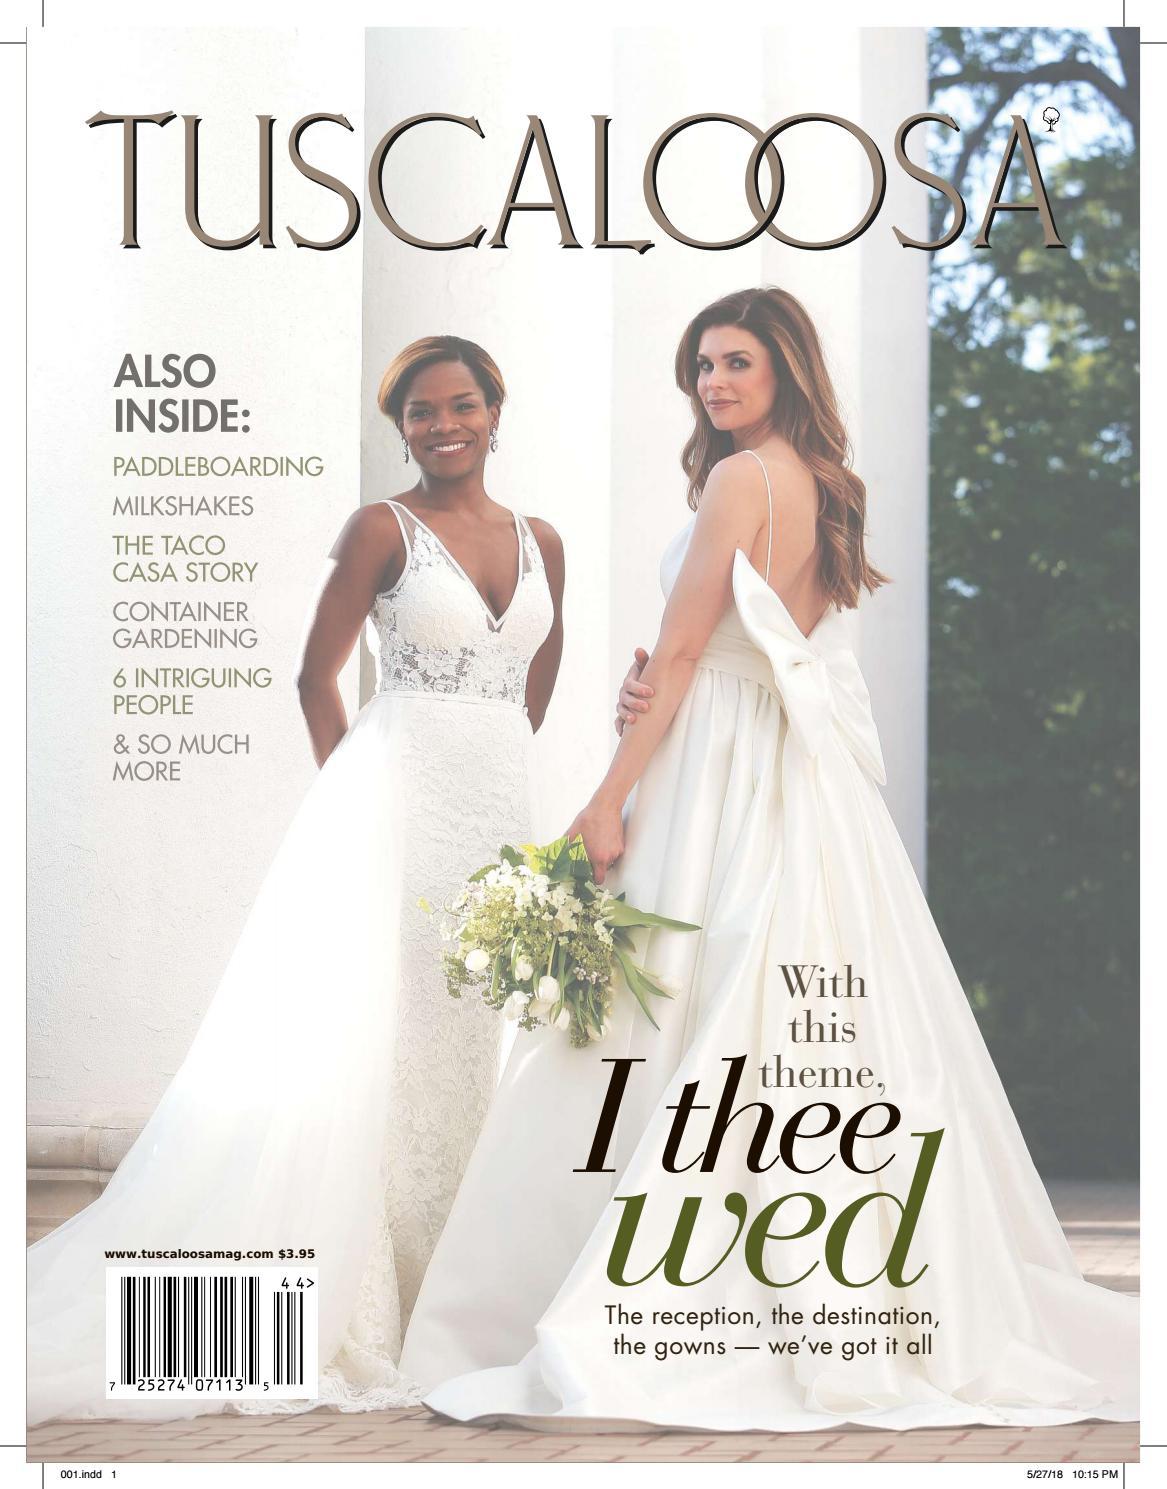 Tuscaloosa Magazine Summer 20 by Tuscaloosa News   issuu